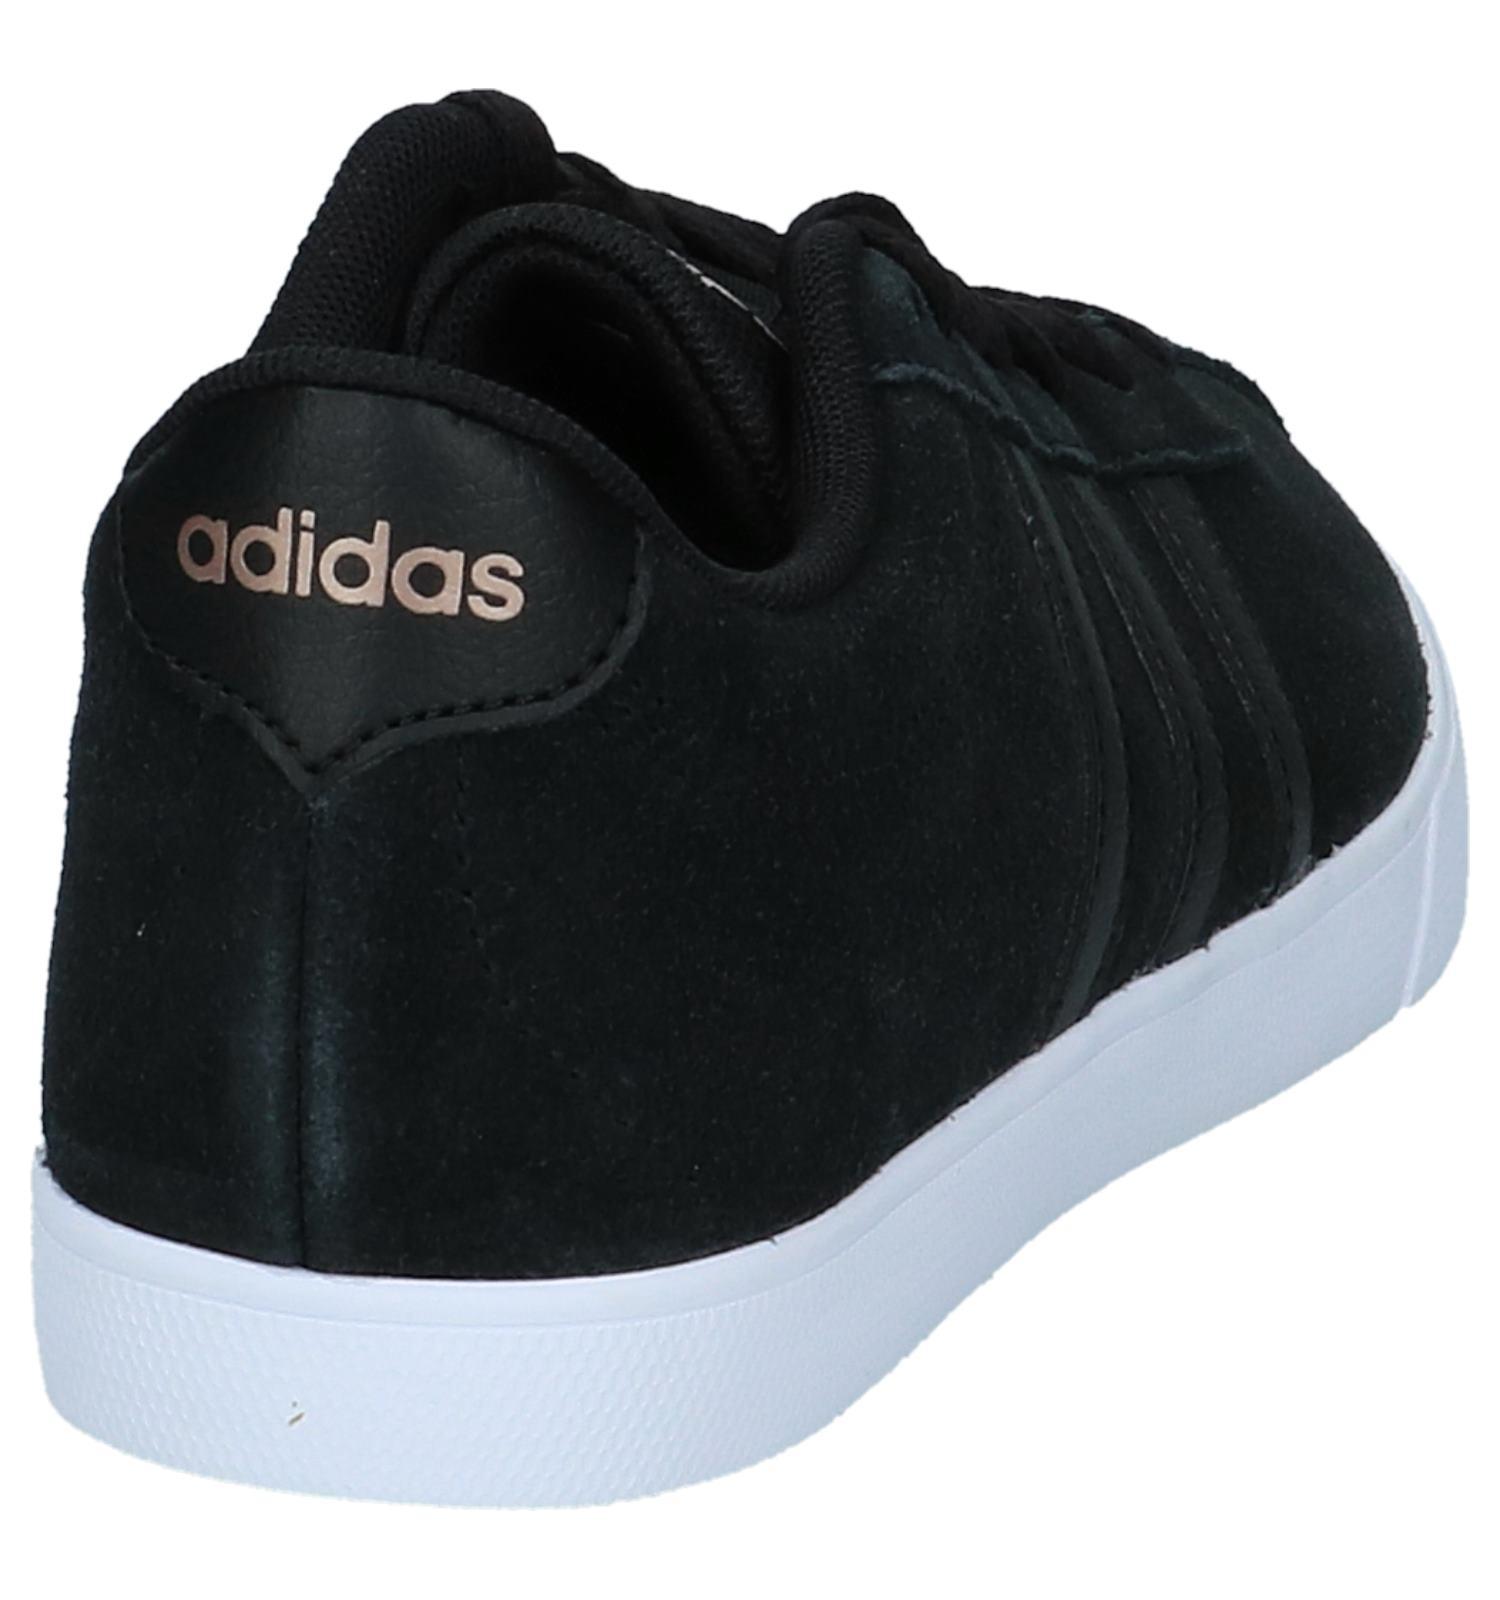 77e1ebc1a75 Zwarte Sneakers adidas Courtset W | TORFS.BE | Gratis verzend en retour